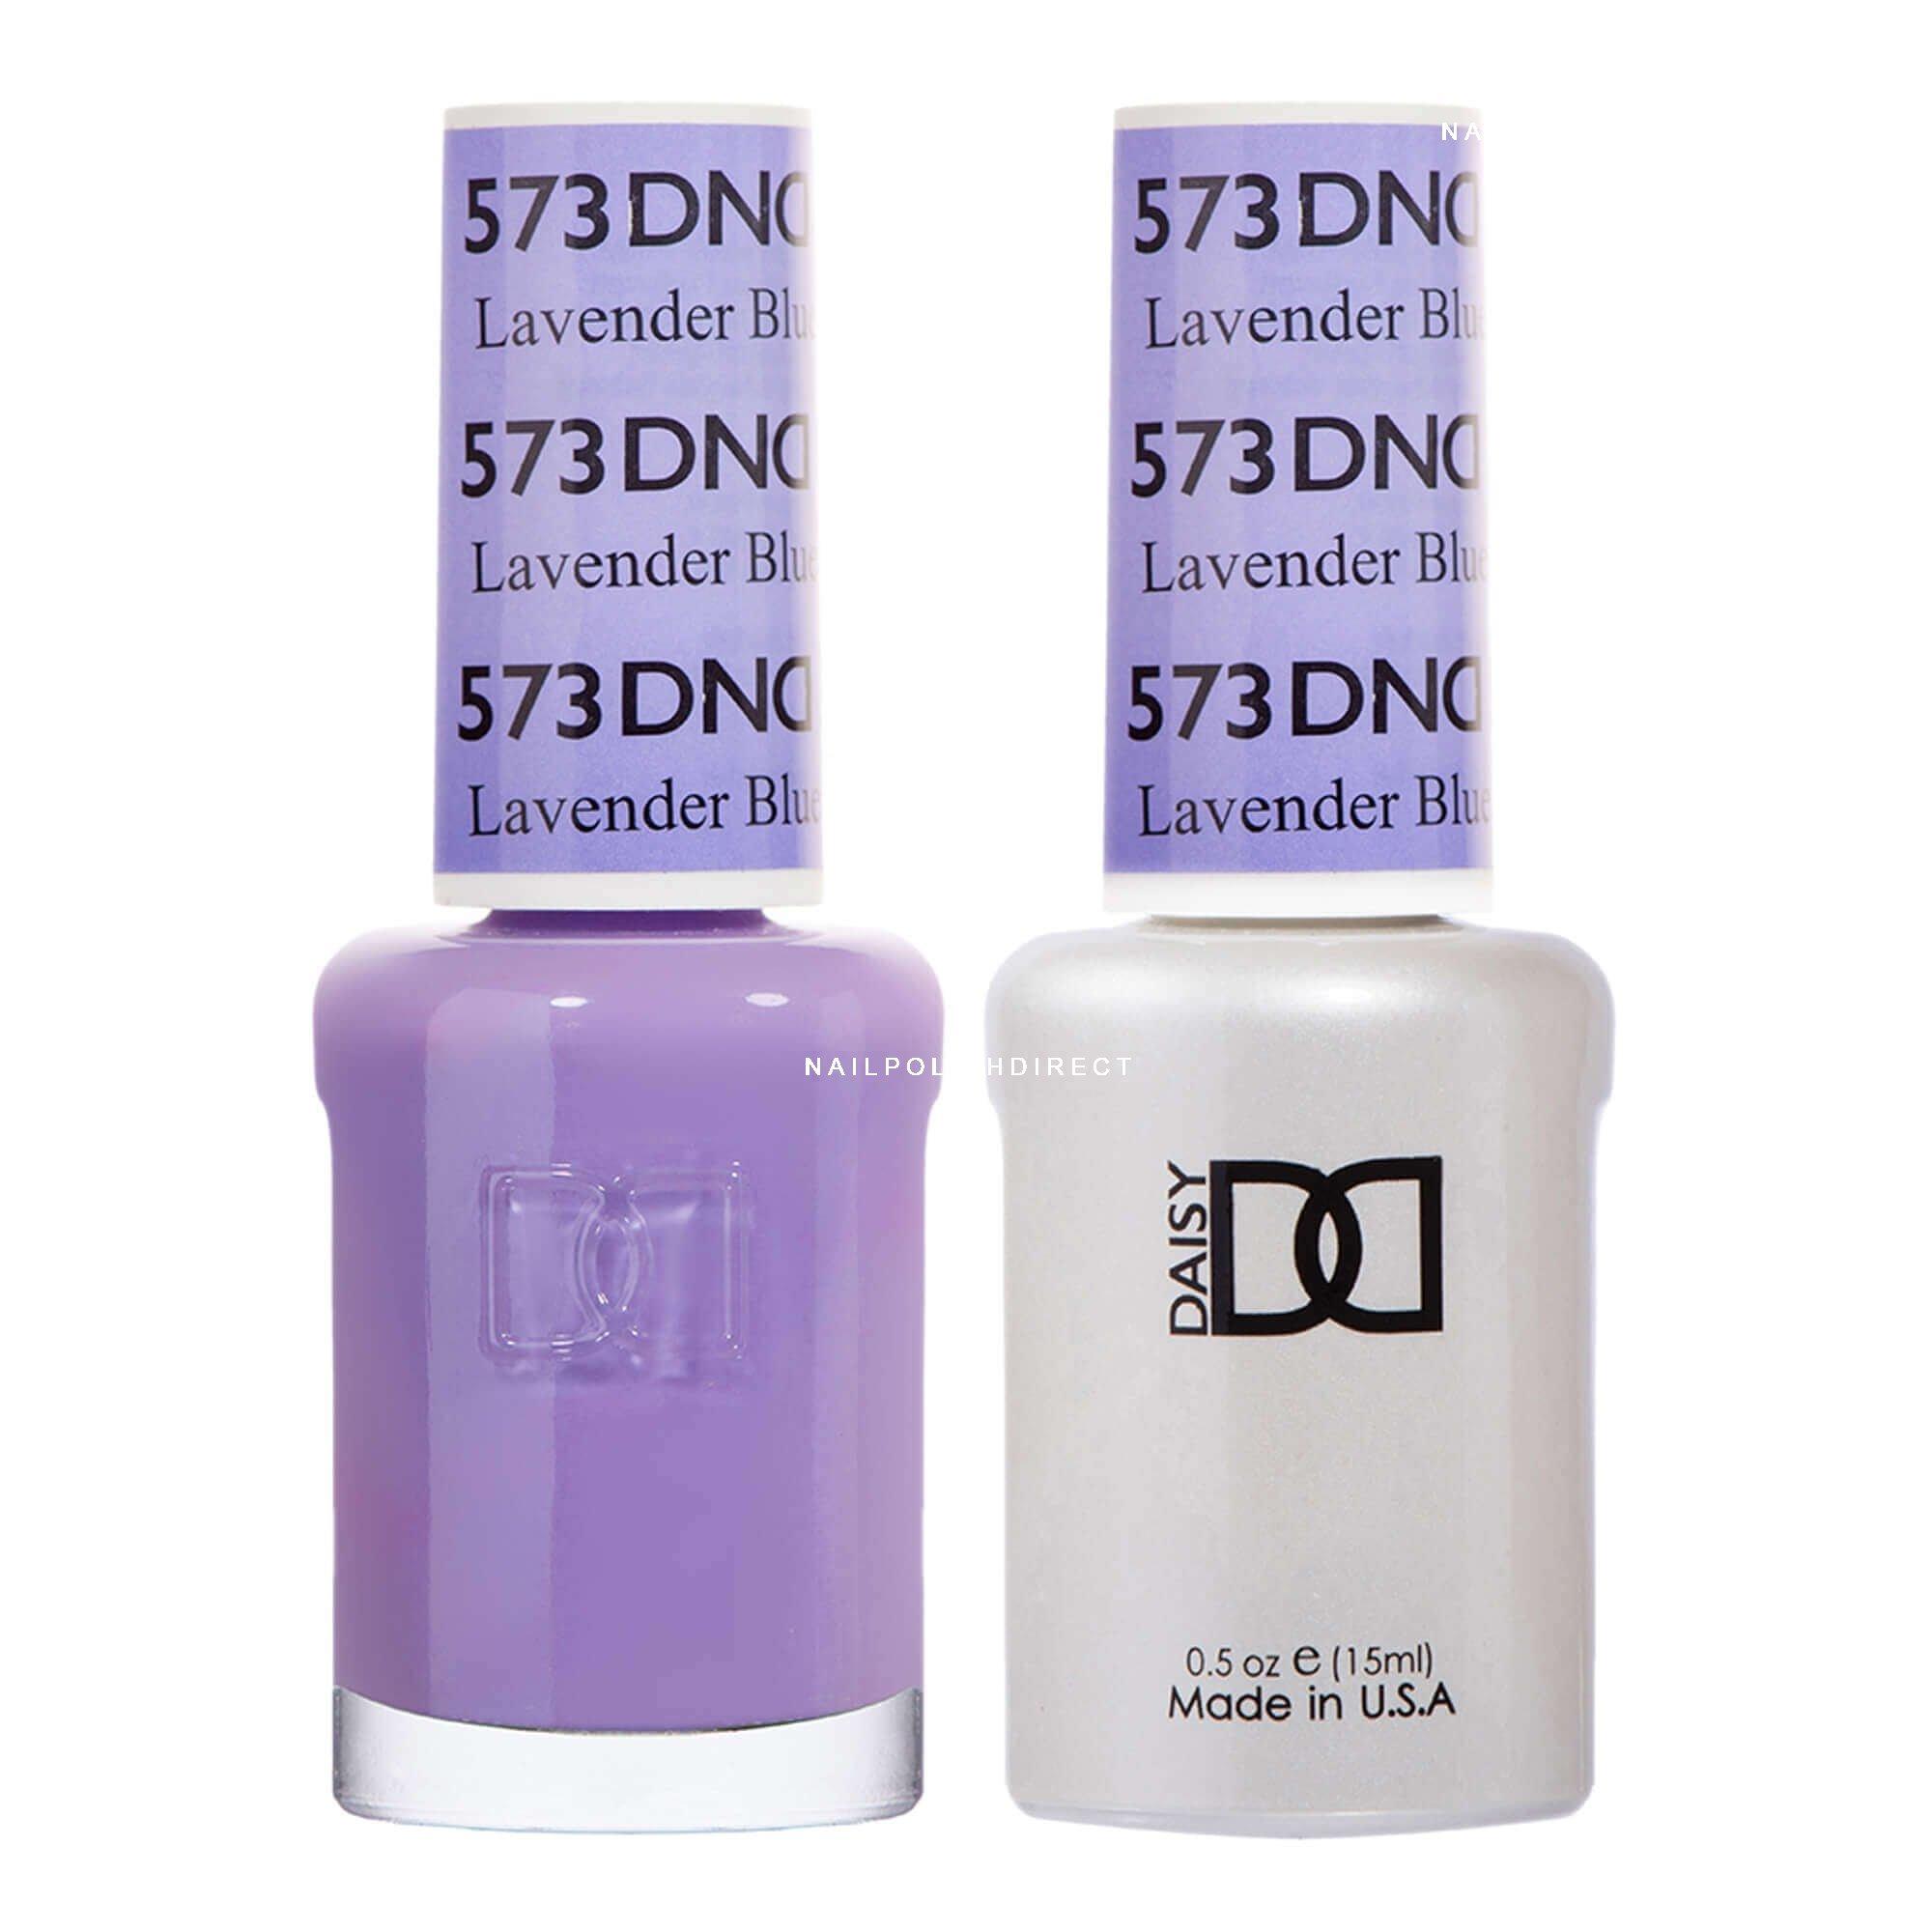 taille 40 d2b14 644e8 Duo Gel & Nail Polish Set - Lavender Blue 573 - 2x15ml